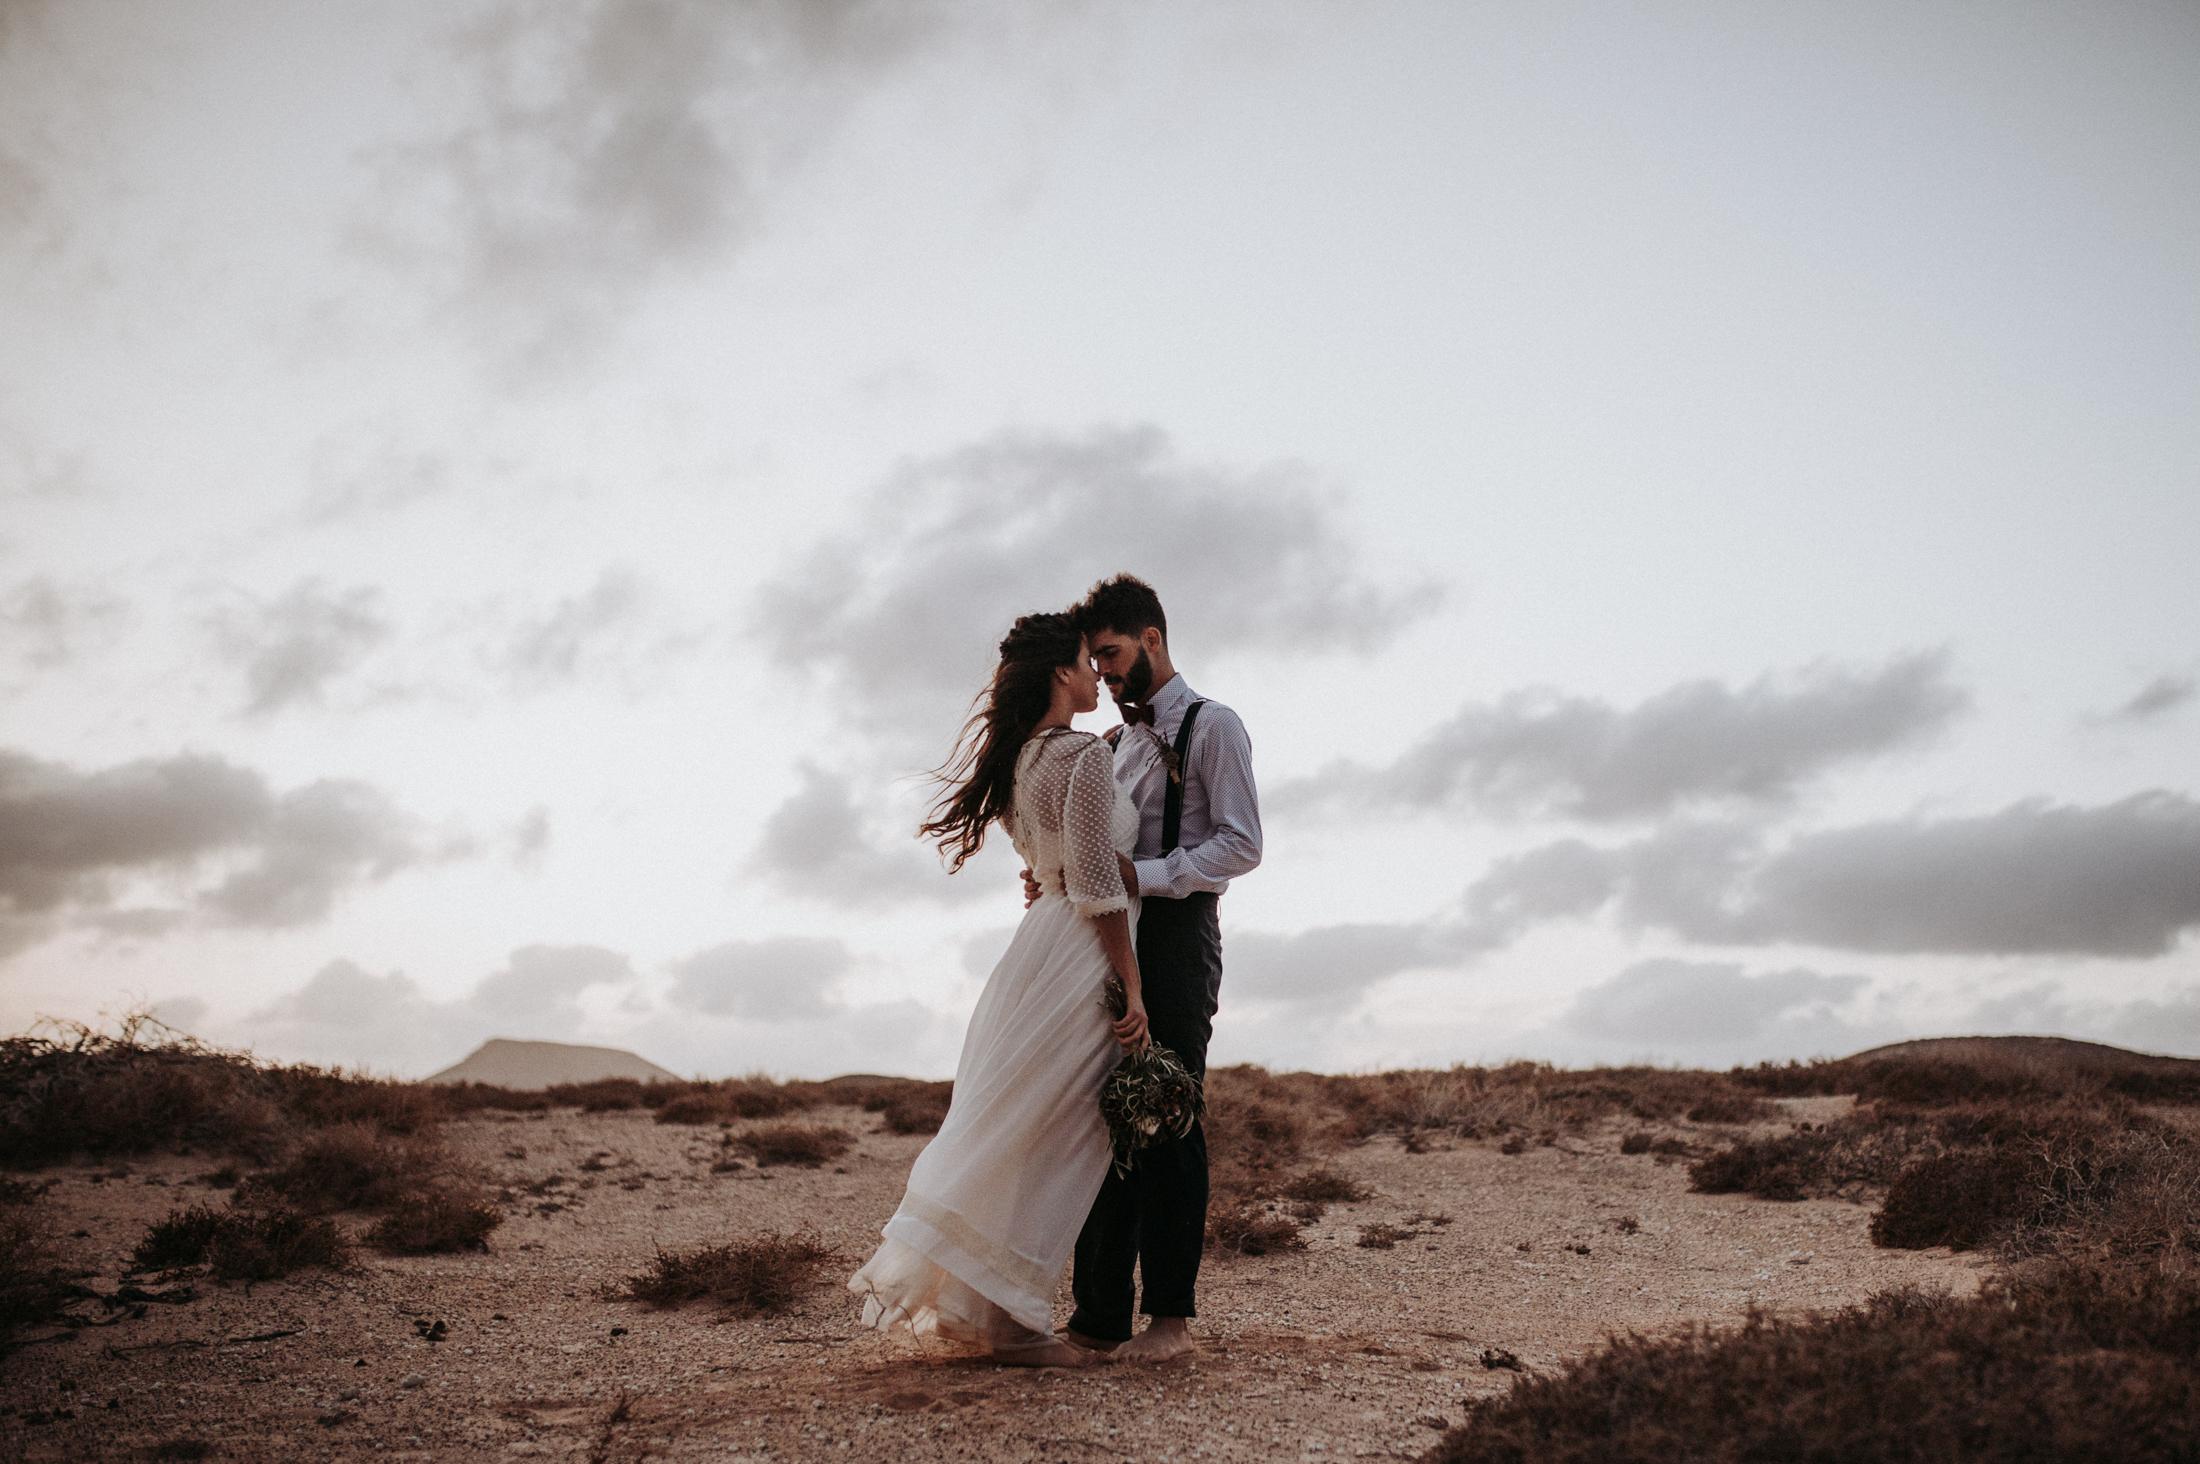 Wedding_Photographer_Mallorca_Daniela-Marquardt_Photography_CanaryIslands_Lanzarote_Iceland_Tuskany_Santorini_Portugal_Schweiz_Austria_Bayern_Elopement_Hochzeitsfotograf_43